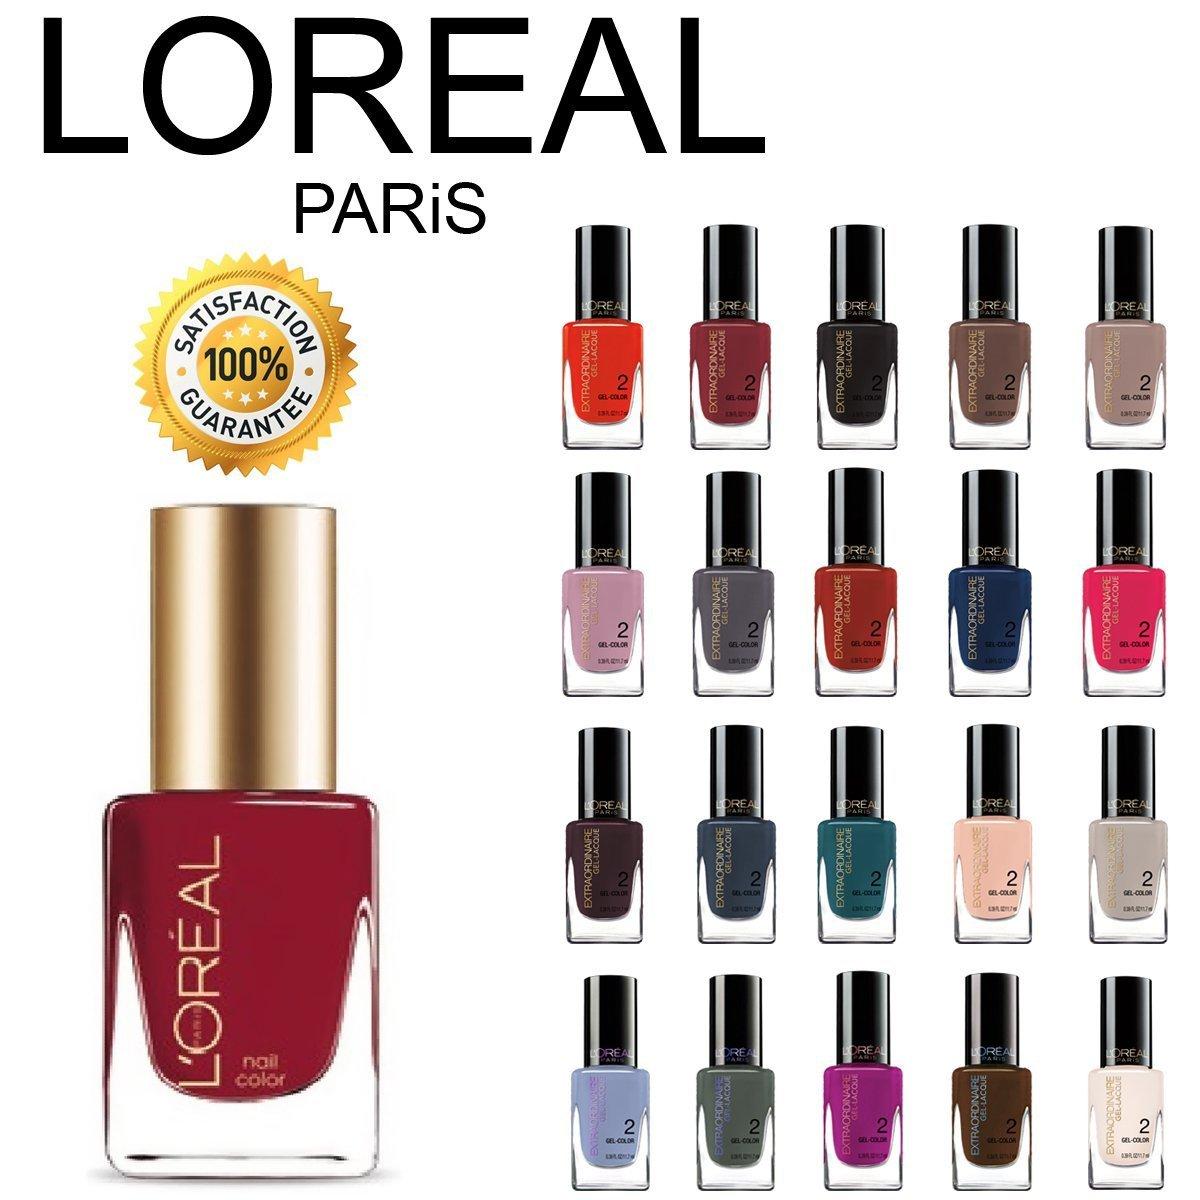 Amazon.com: L'Oreal Paris Extraordinaire Gel-Lacque 1-2-3